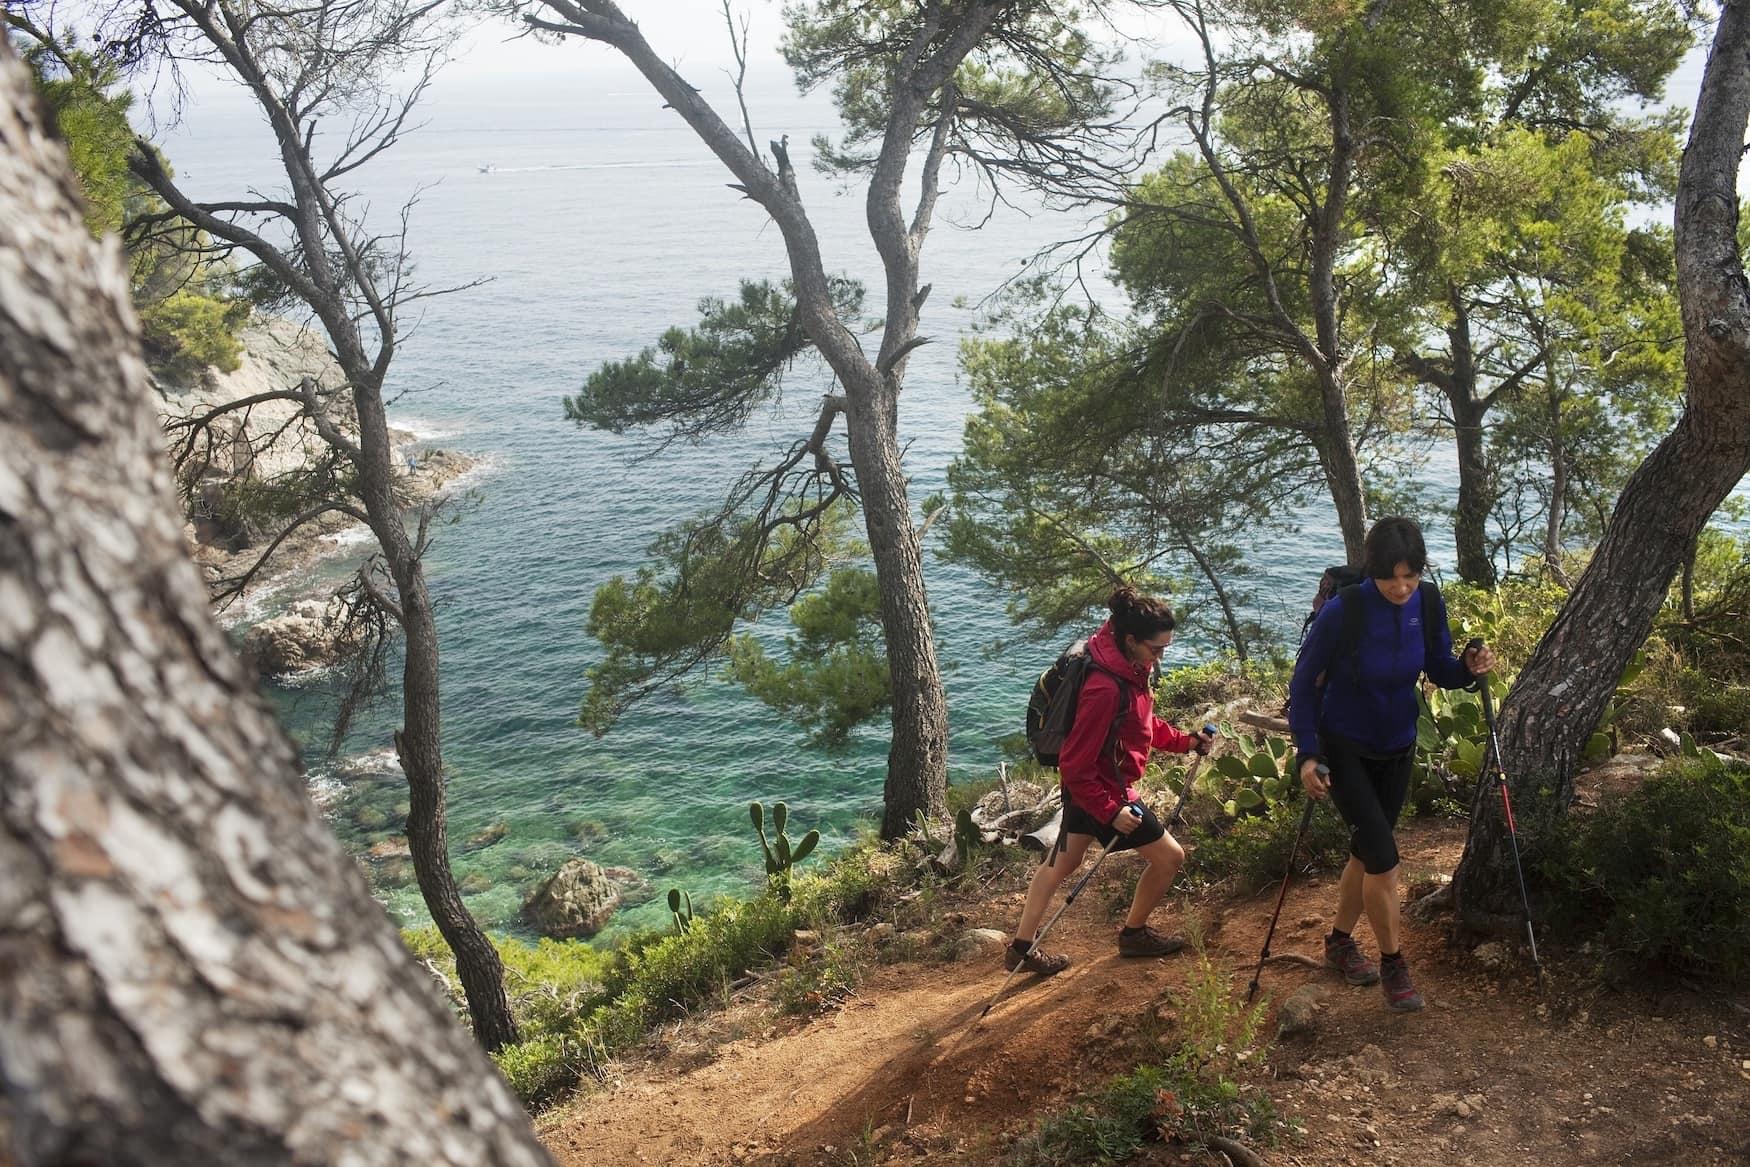 Wandern auf dem Camí de Ronda, Costa Brava,